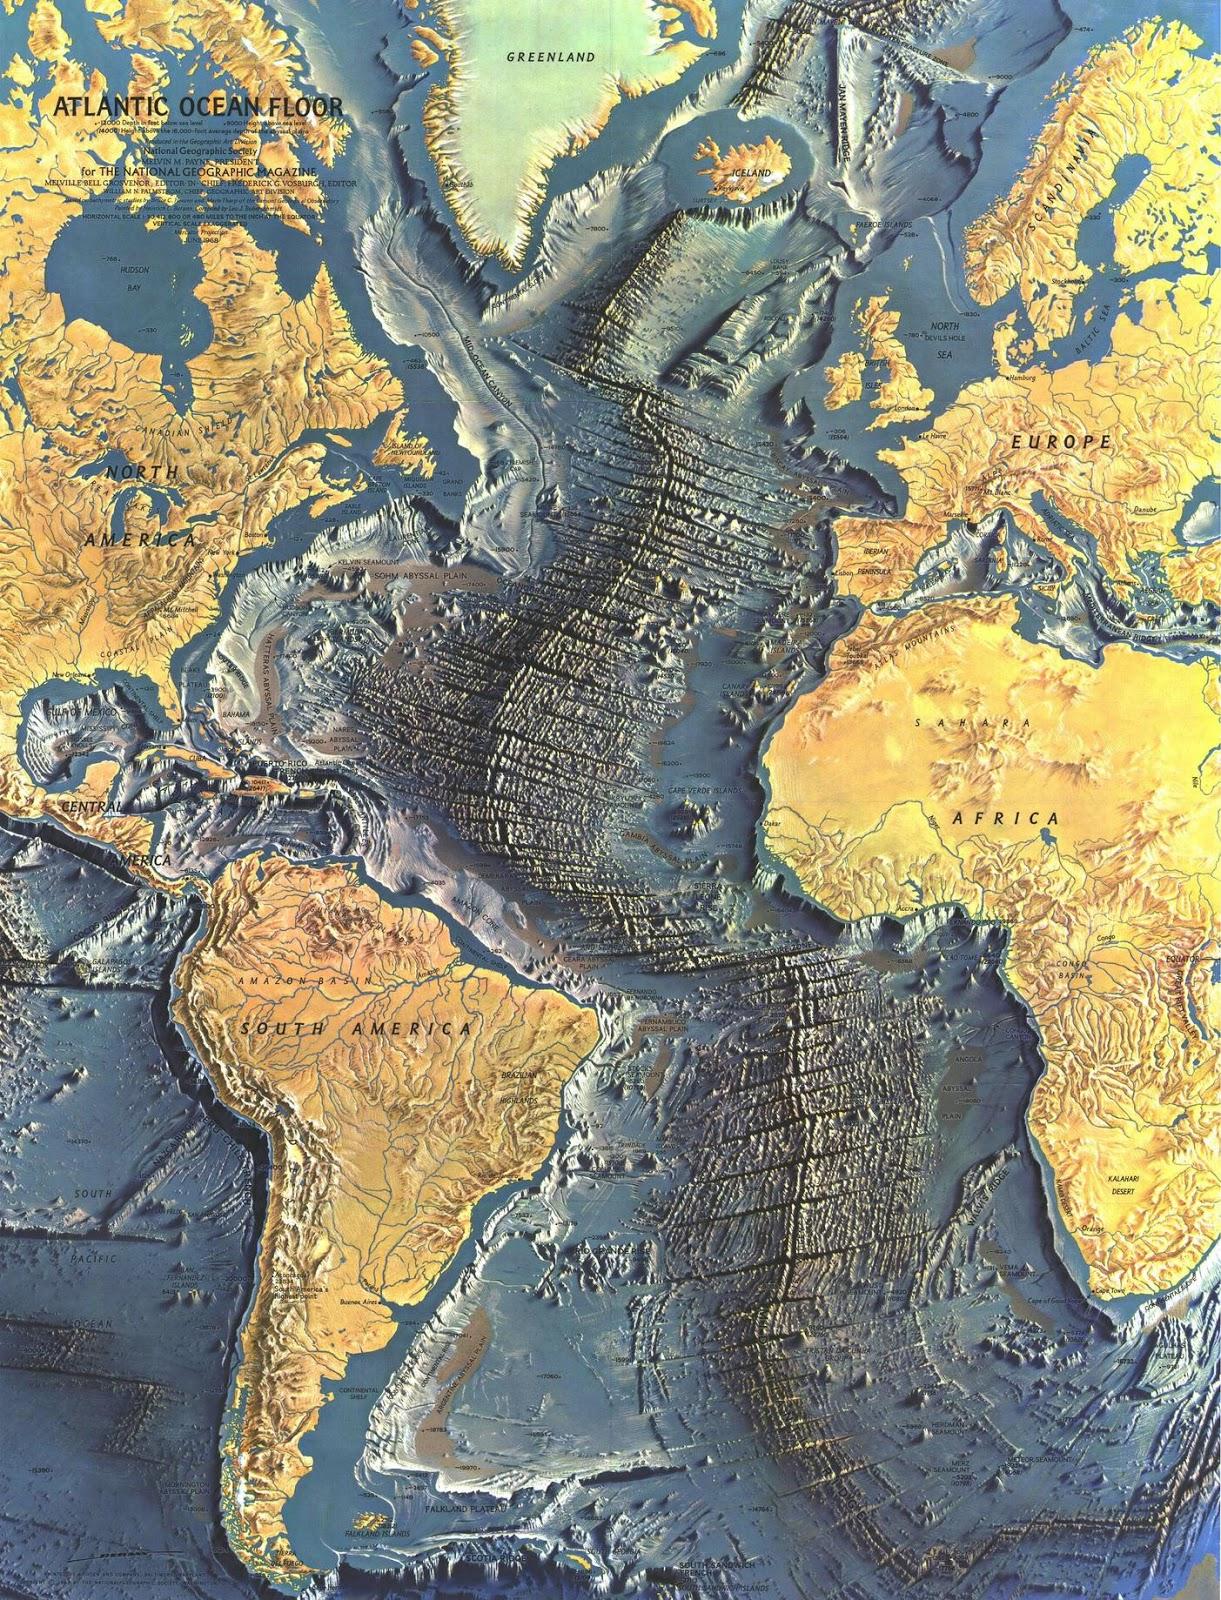 A detailed map of the Atlantic ocean floor